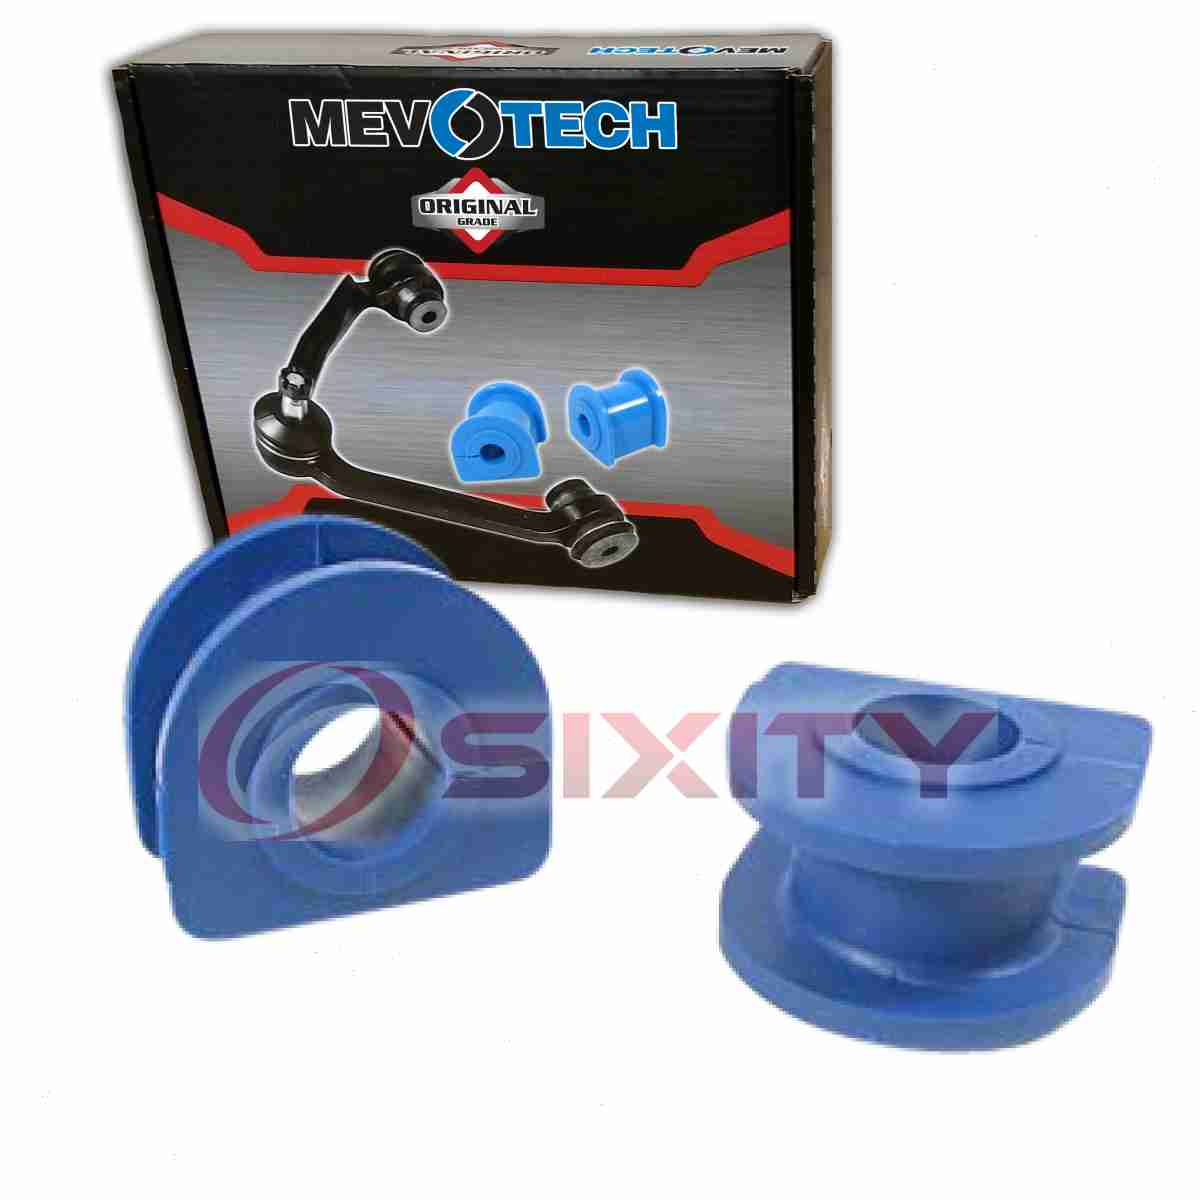 Mevotech Rear To Frame Stabilizer Bar Bushing Kit for 2000-2014 GMC Yukon XL gs